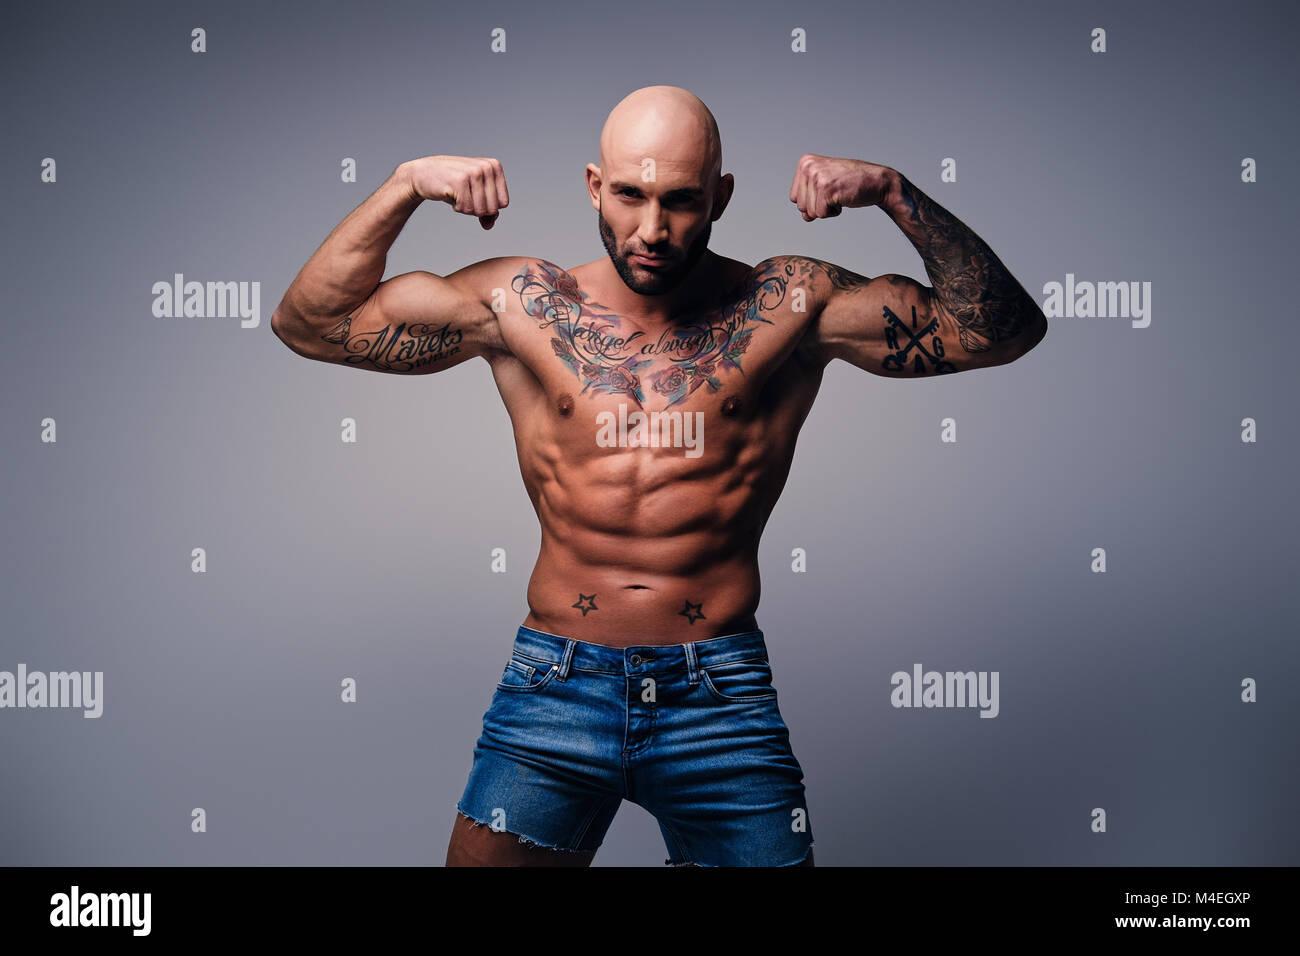 muskulöse männer mit tattoos